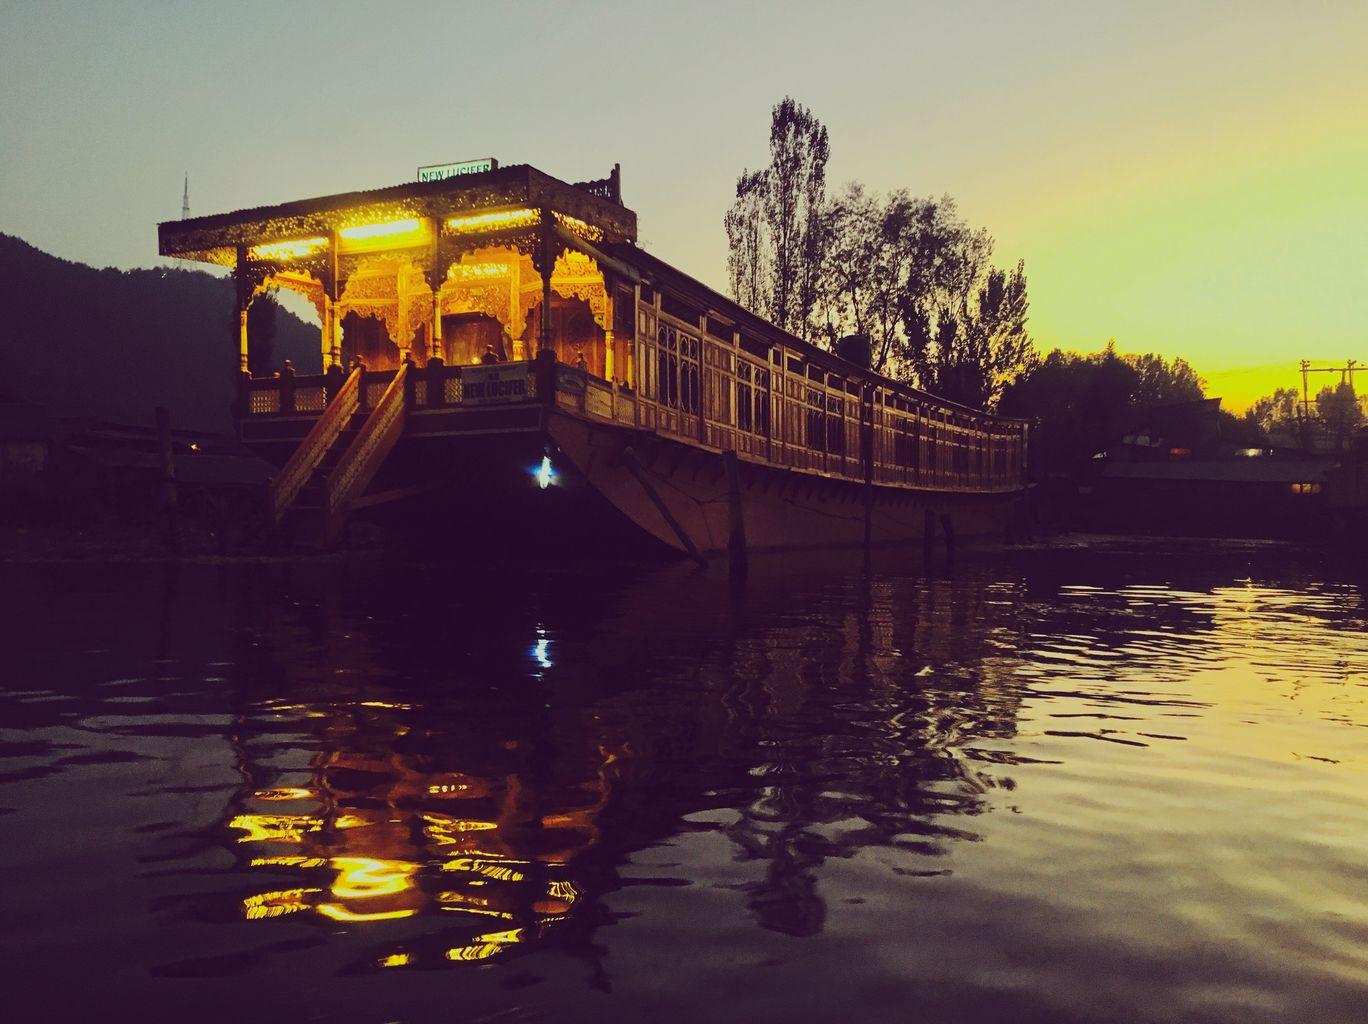 Photo of Dal Lake By Varsha Parwani